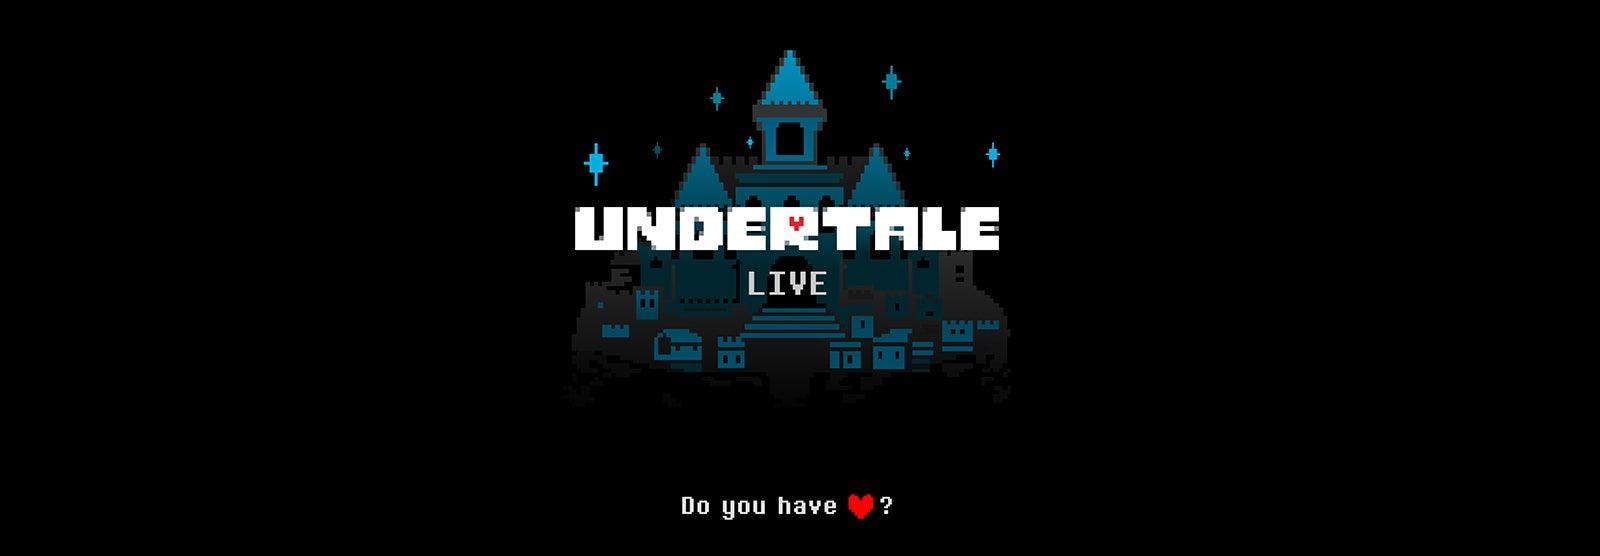 Undertale Live